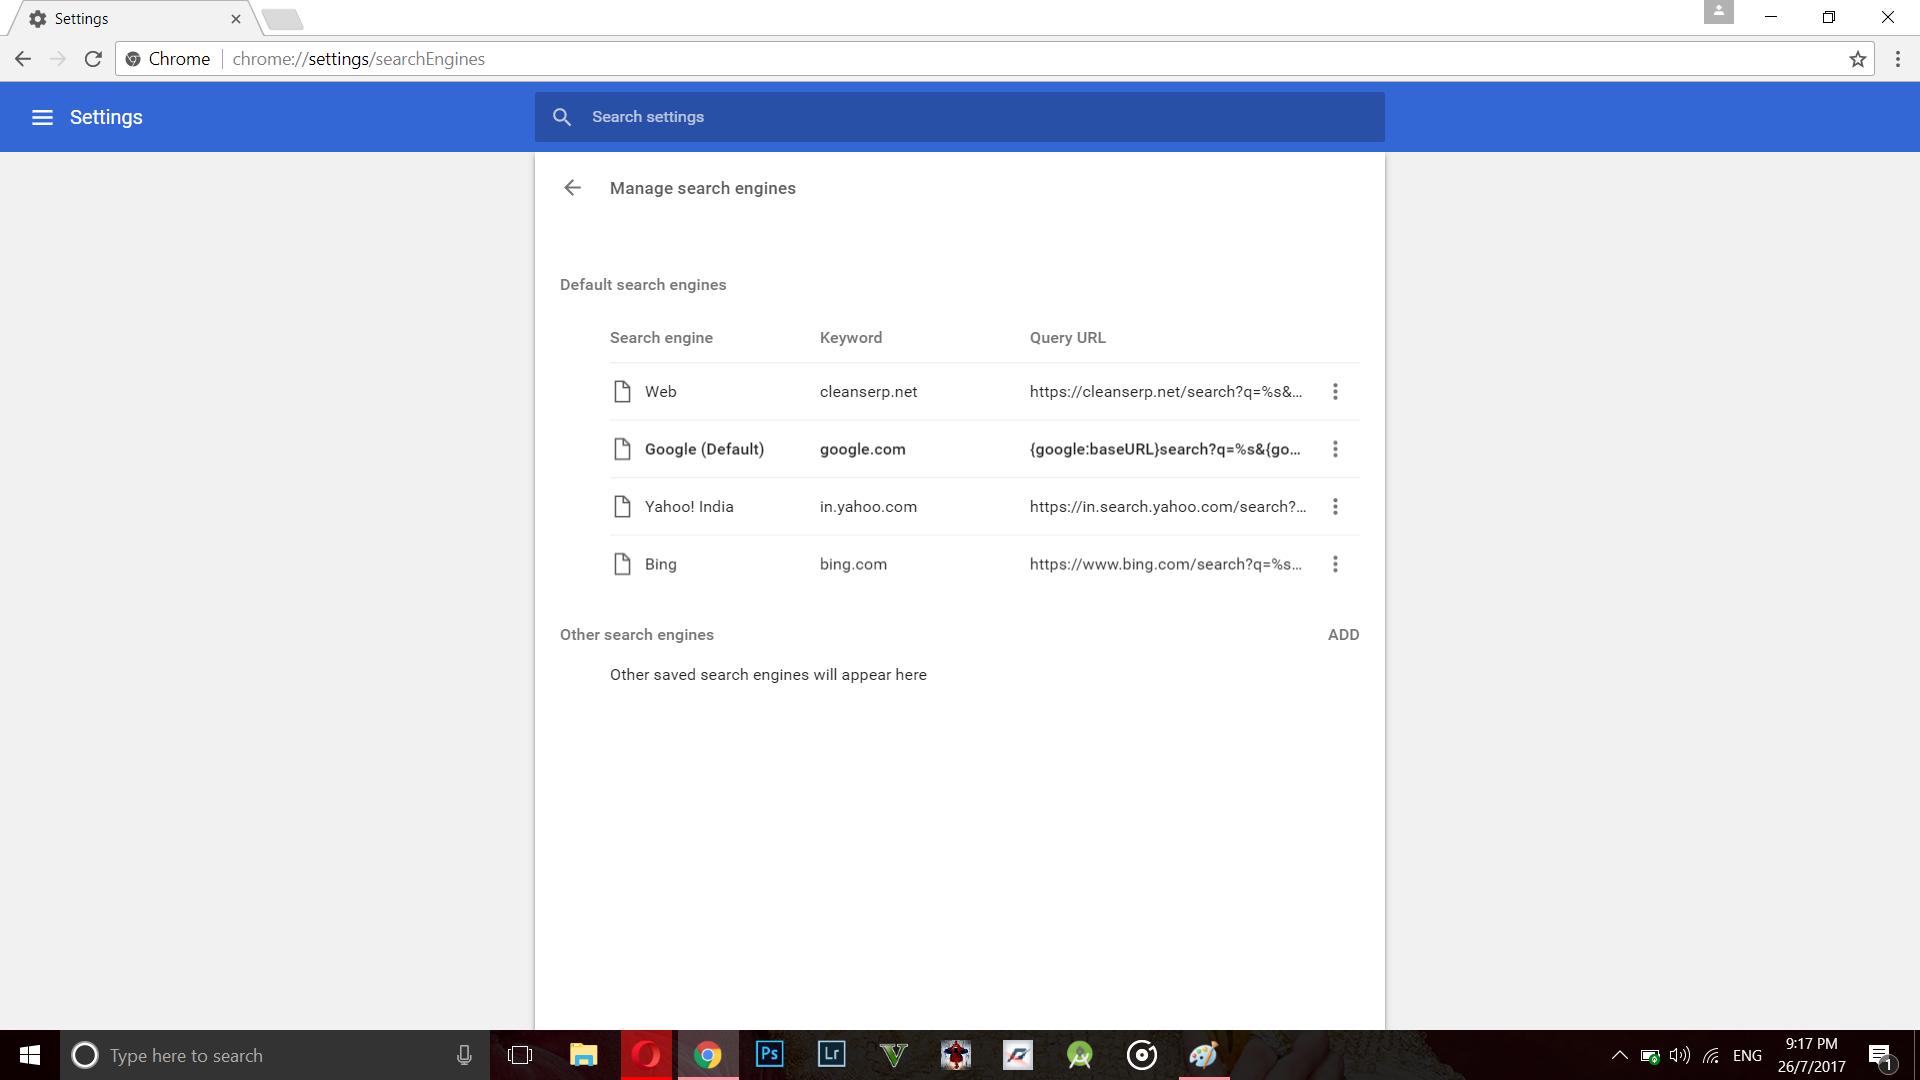 Google chrome home page shortcut - Step 5